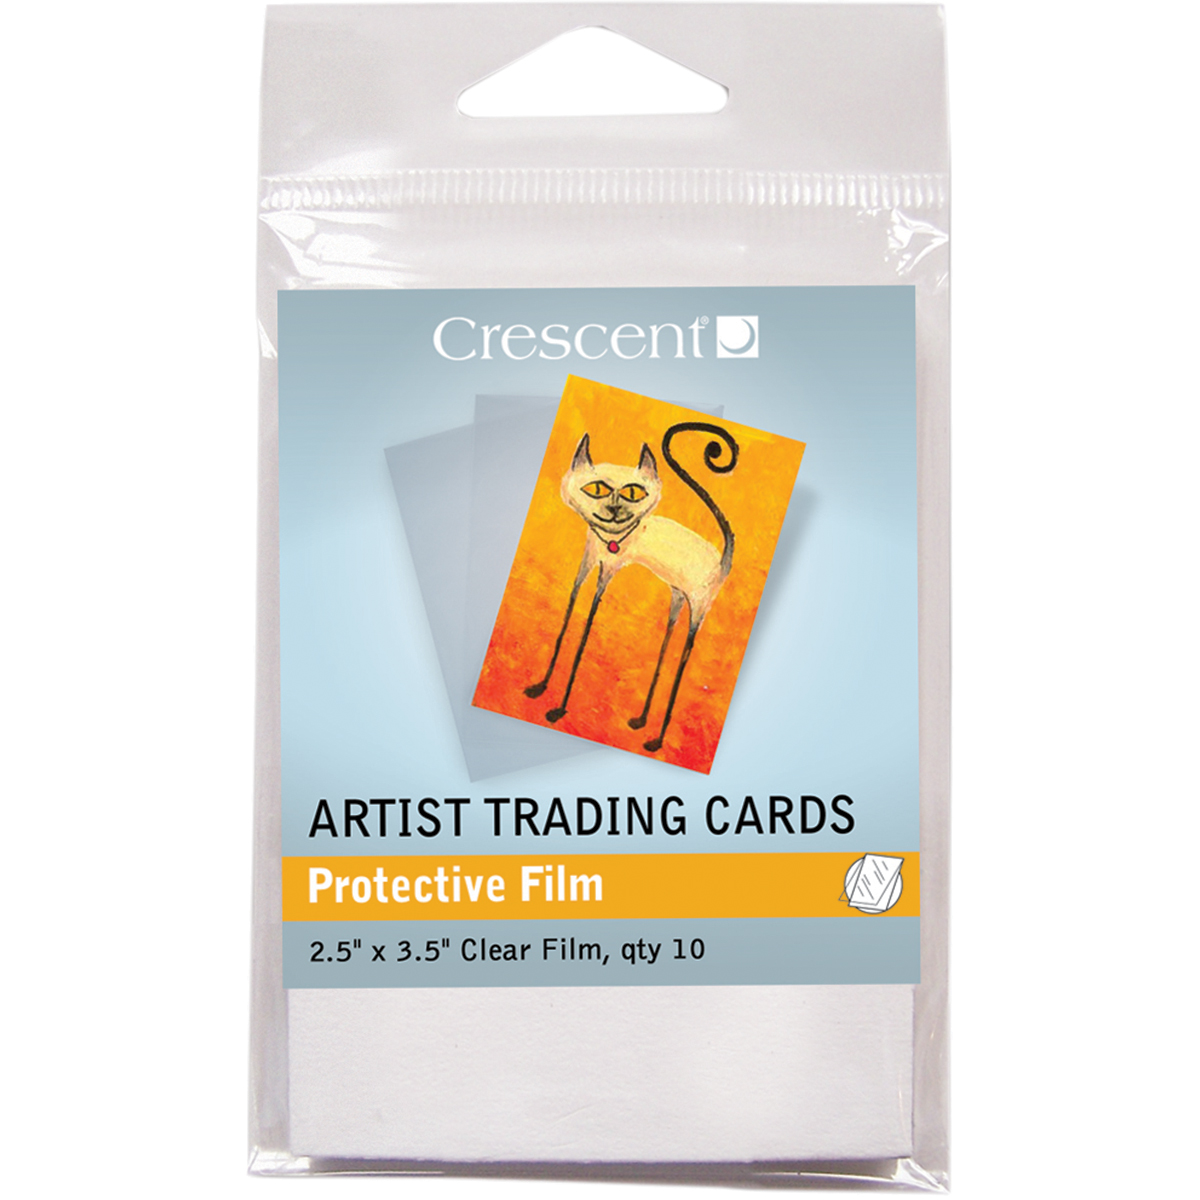 "Crescent Artist Trading Cards 2.5""X3.5"" 10/Pkg-Protective Films"